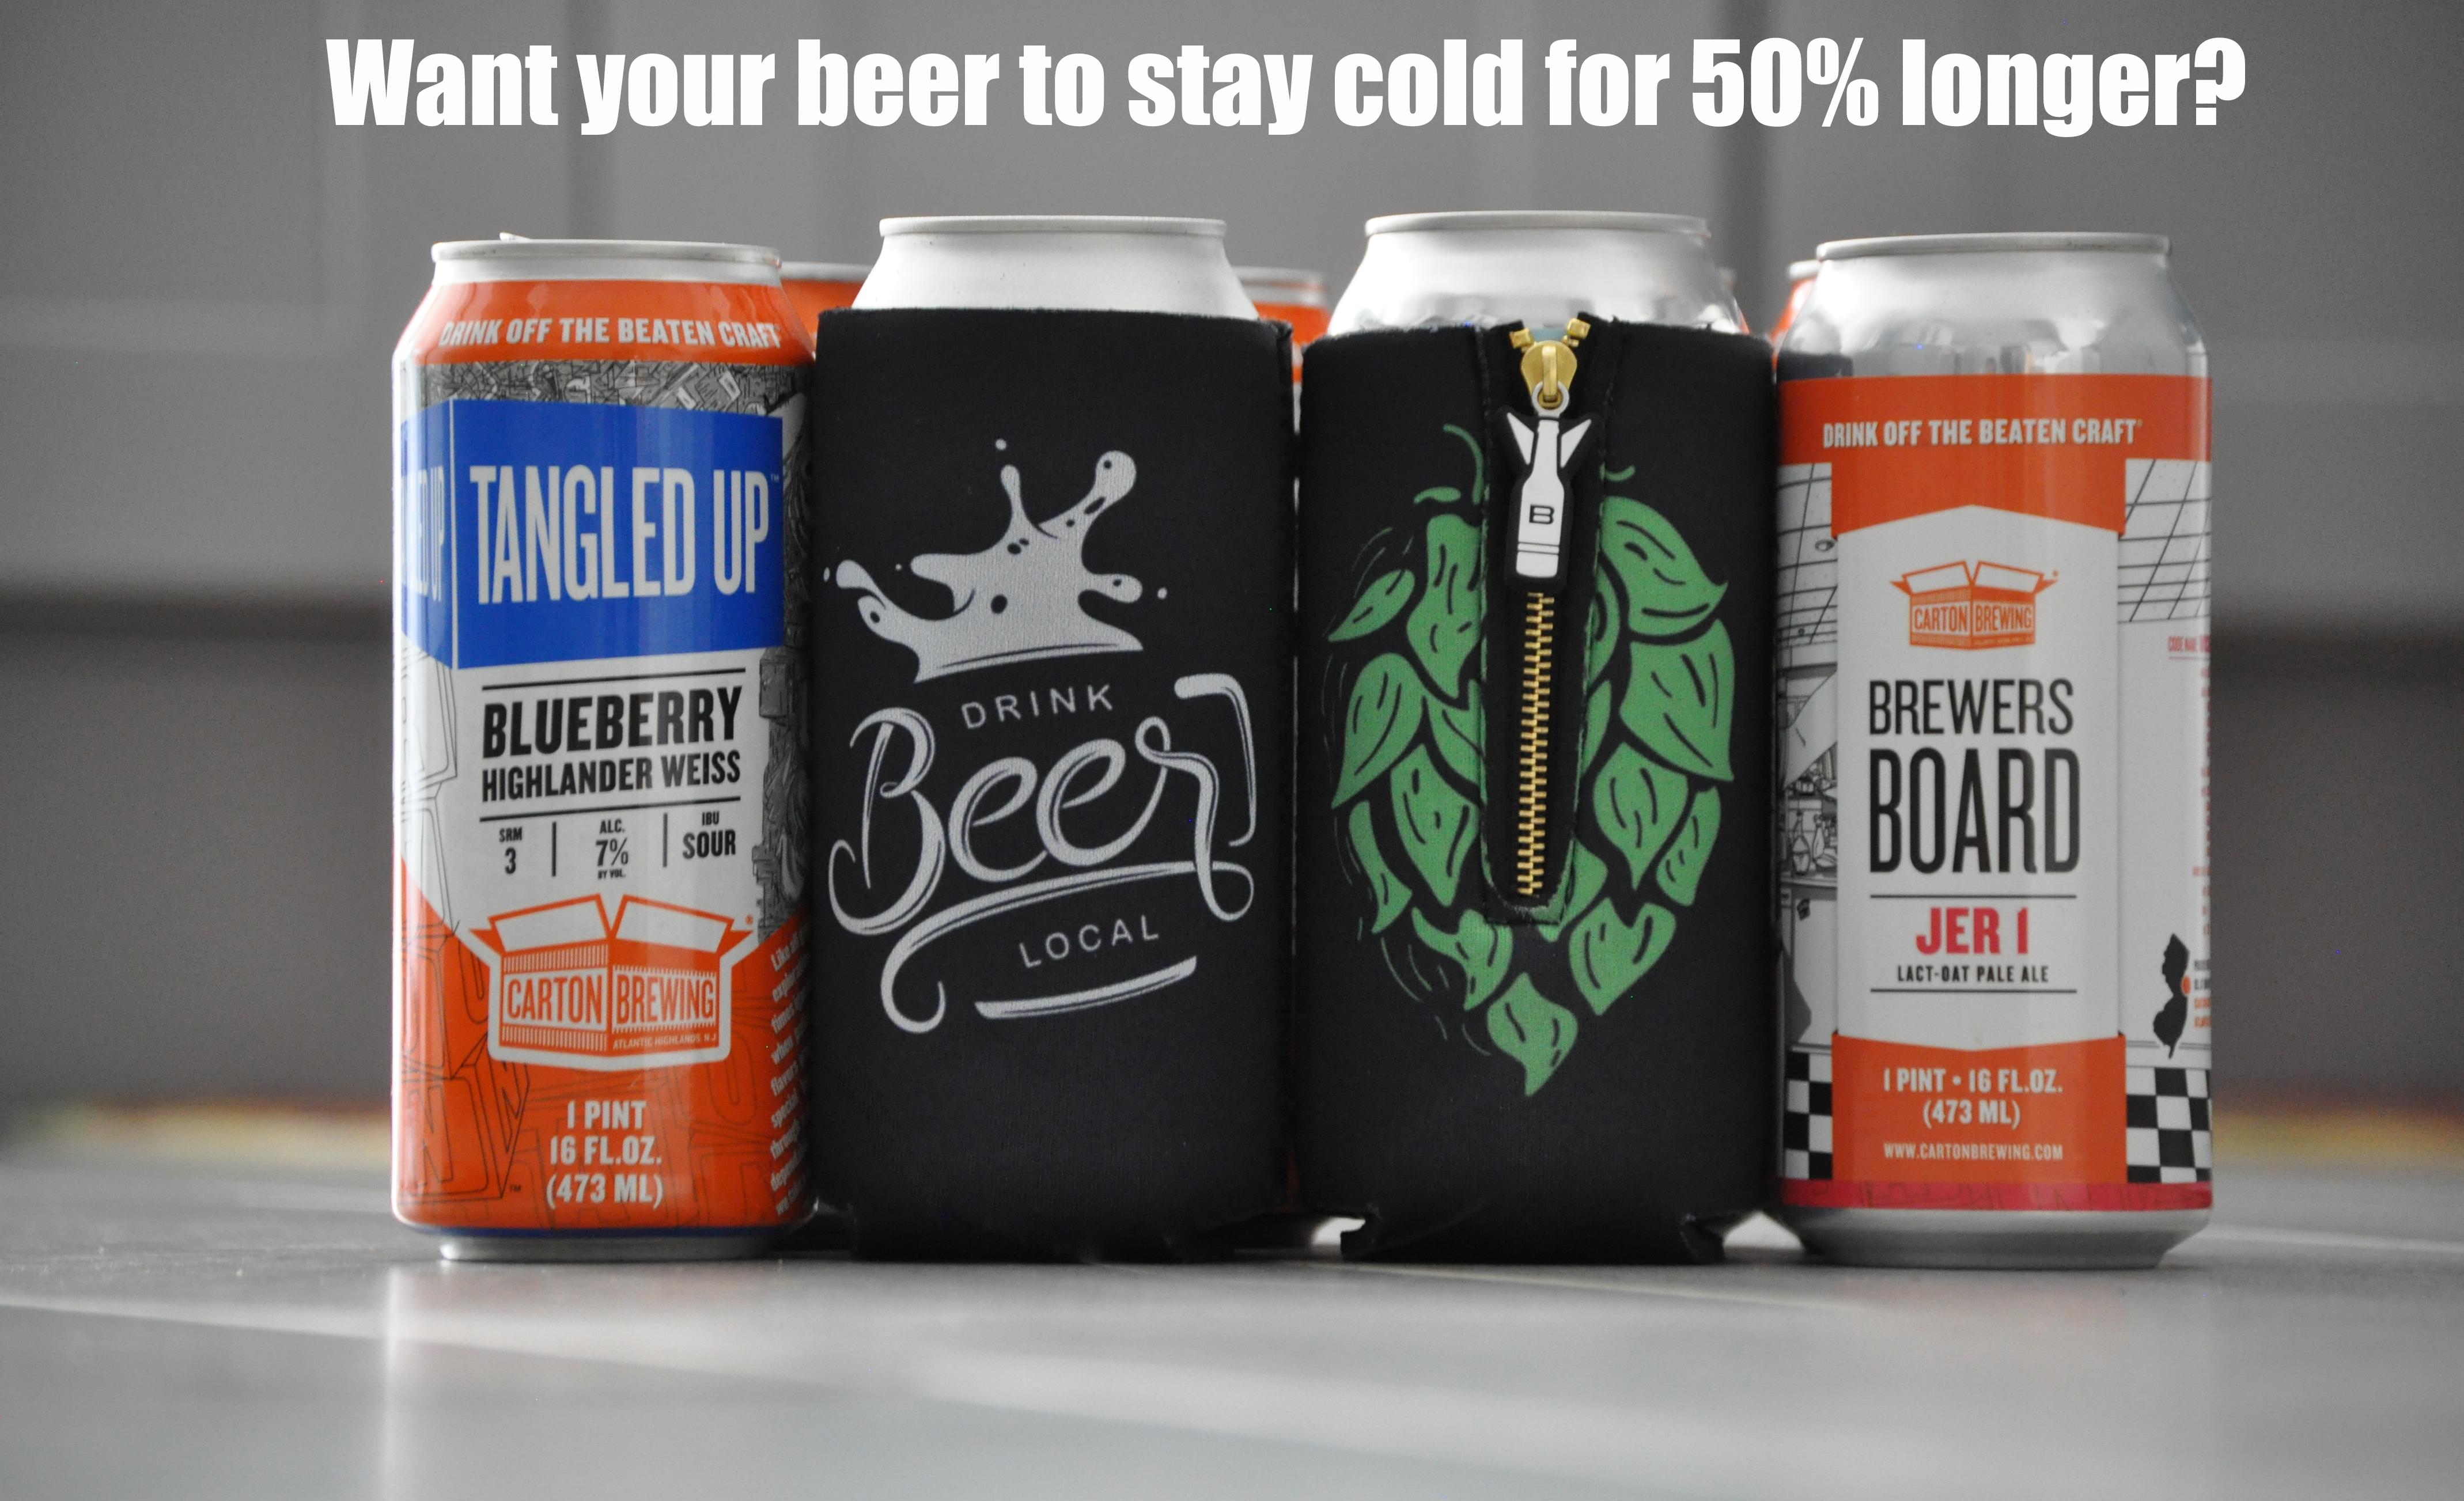 Big Hop 16oz Beer Sleeve Cooler | Drink Local Beer Hugger in 2019